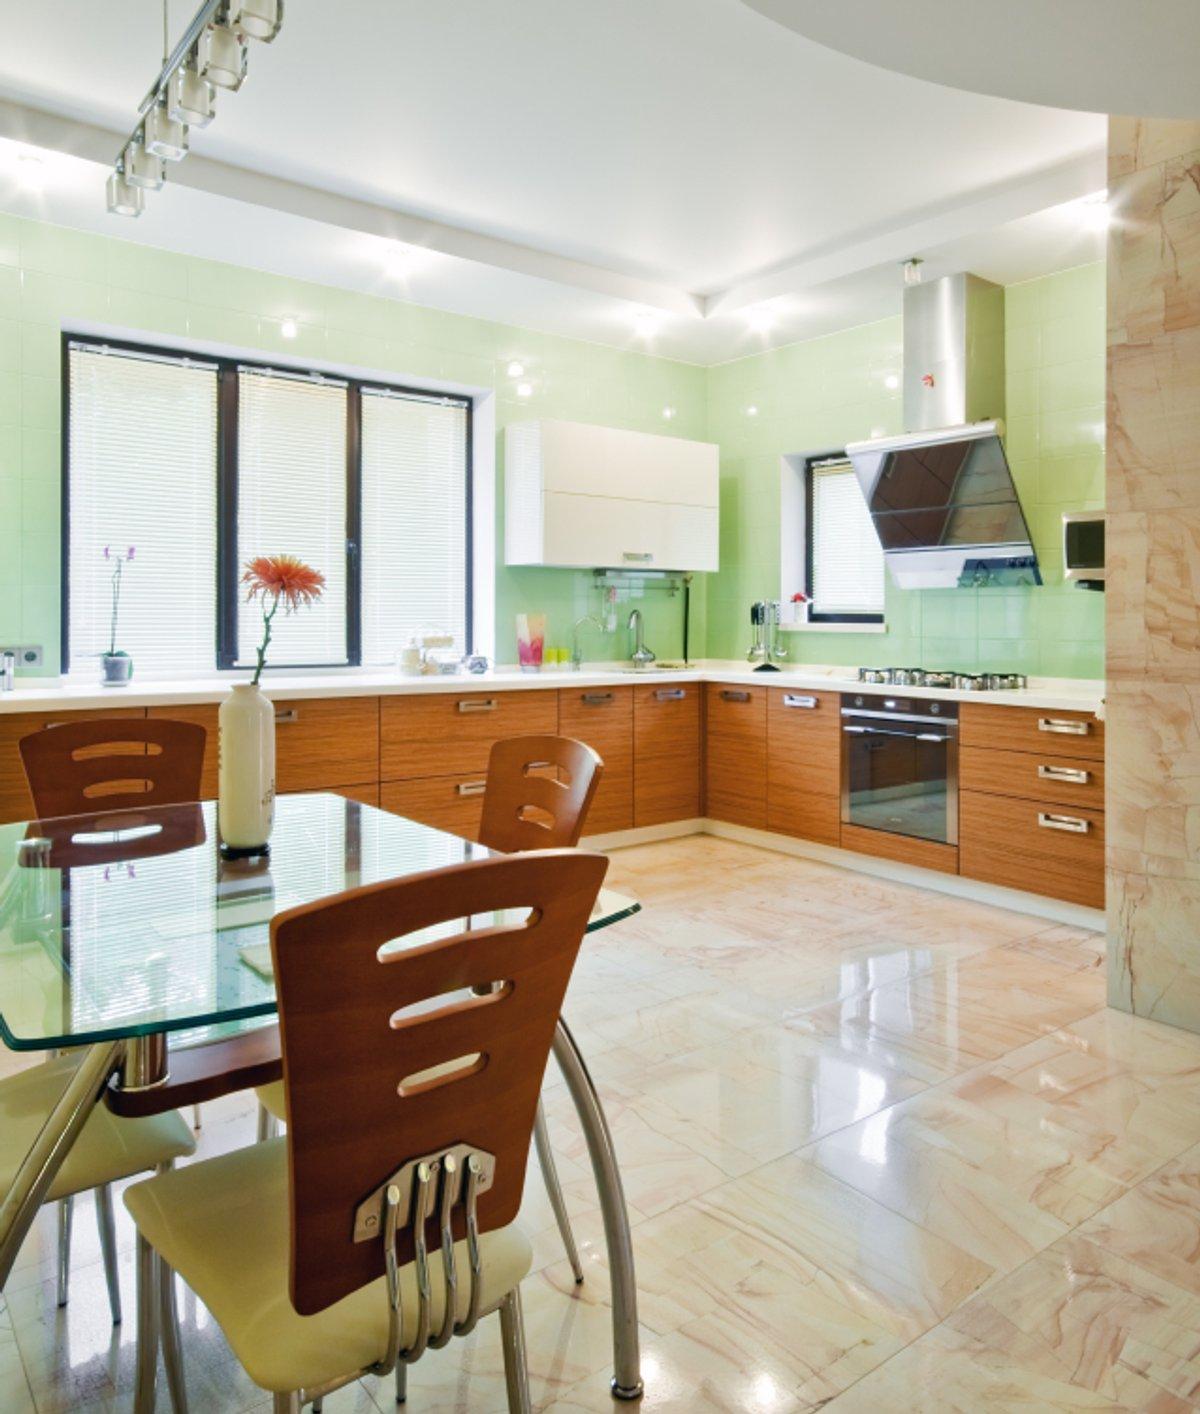 Kitchen Laminate or Tile Flooring